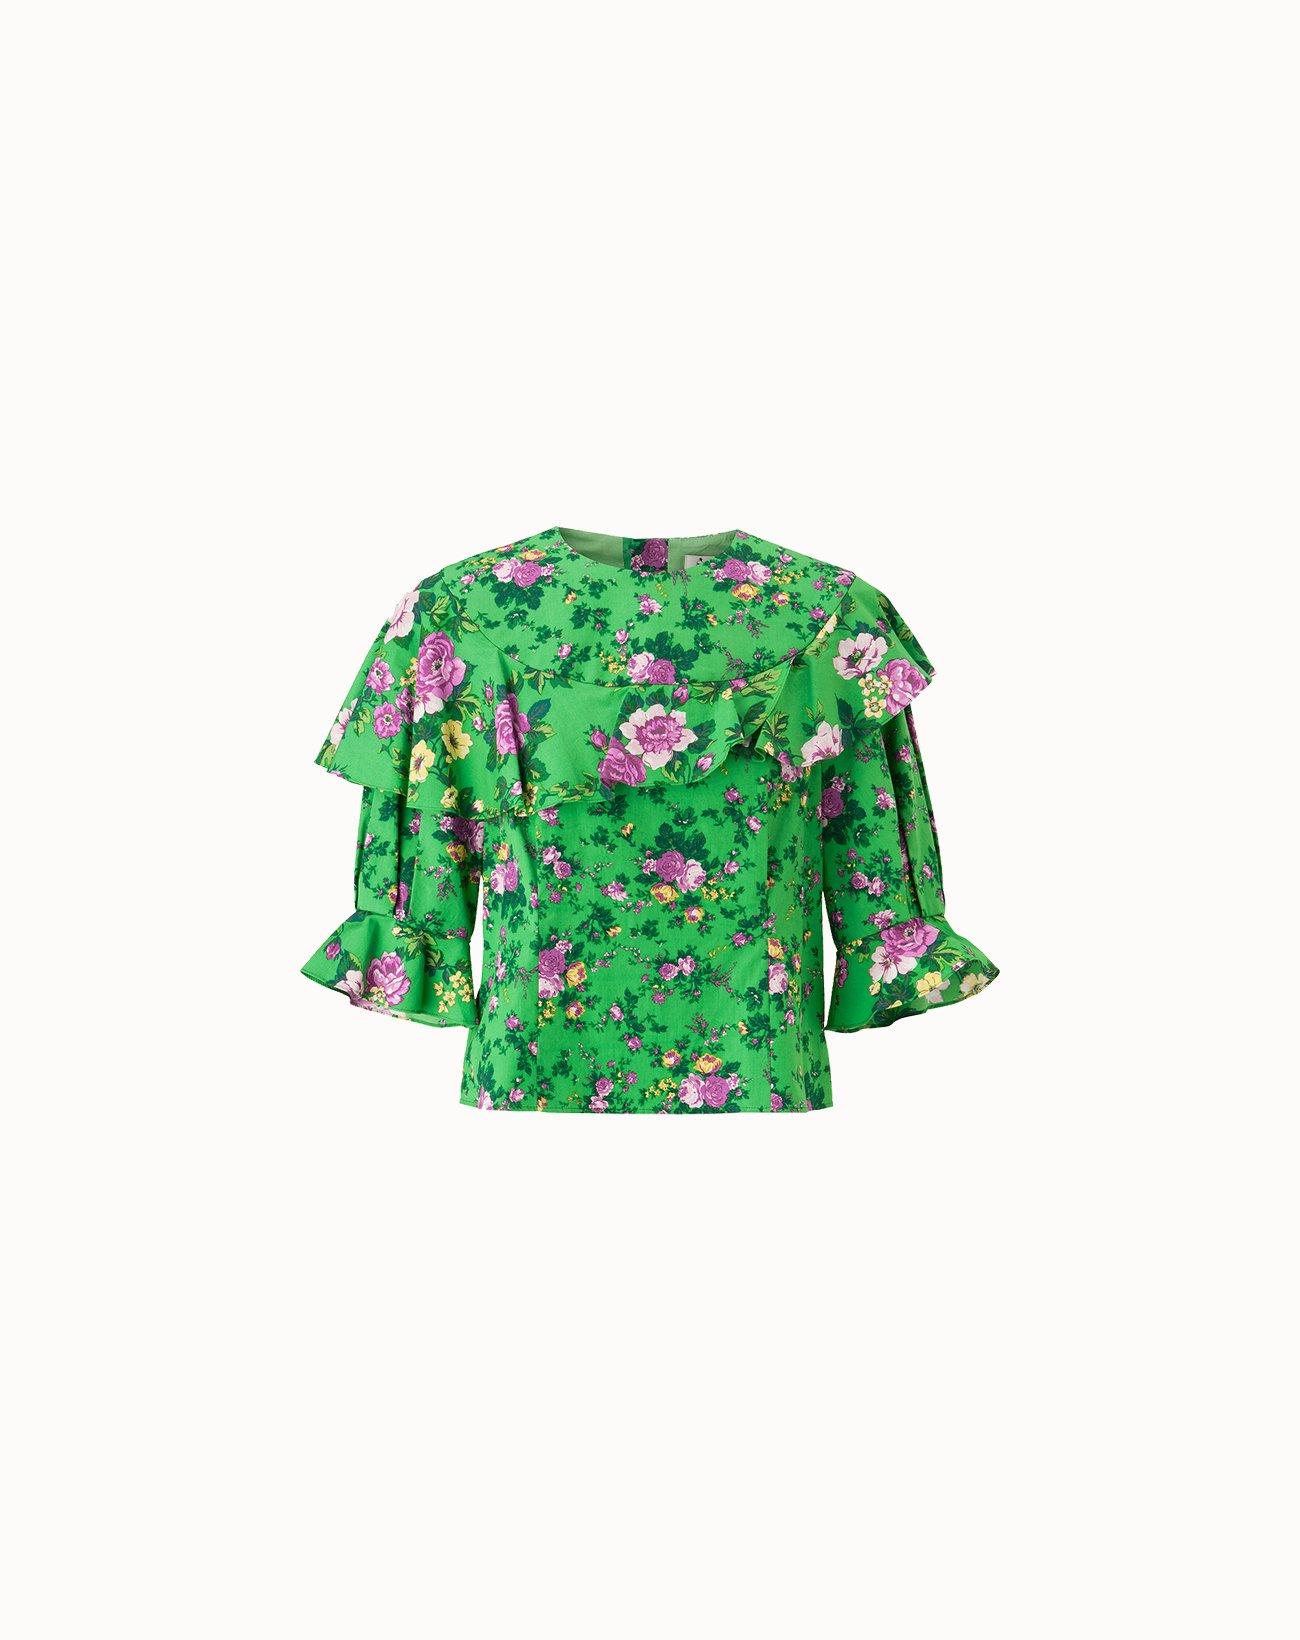 leur logette - Fairy Rose Top - Green